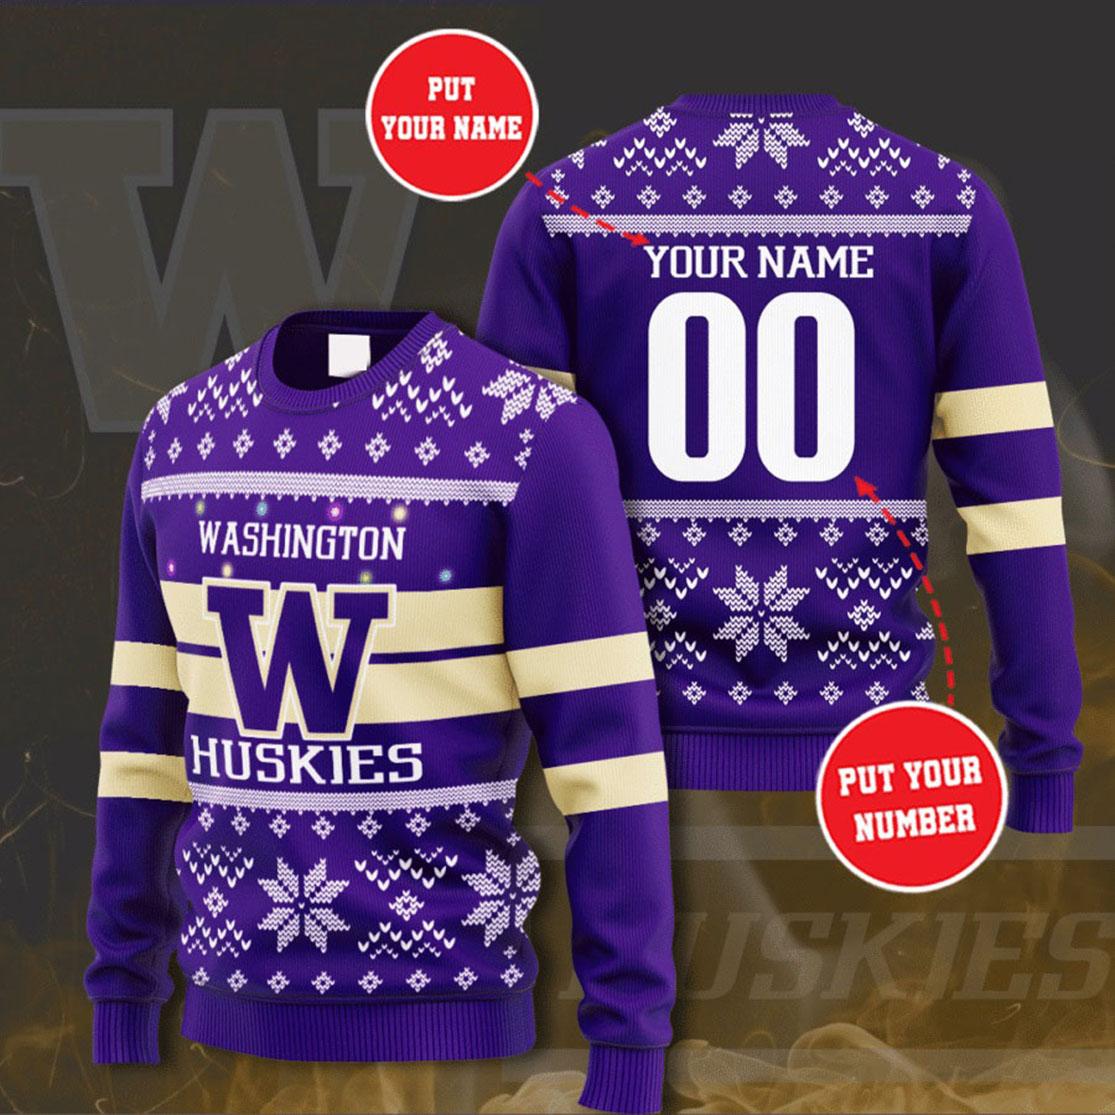 Personalized Name and Number Washington Huskies christmas sweater